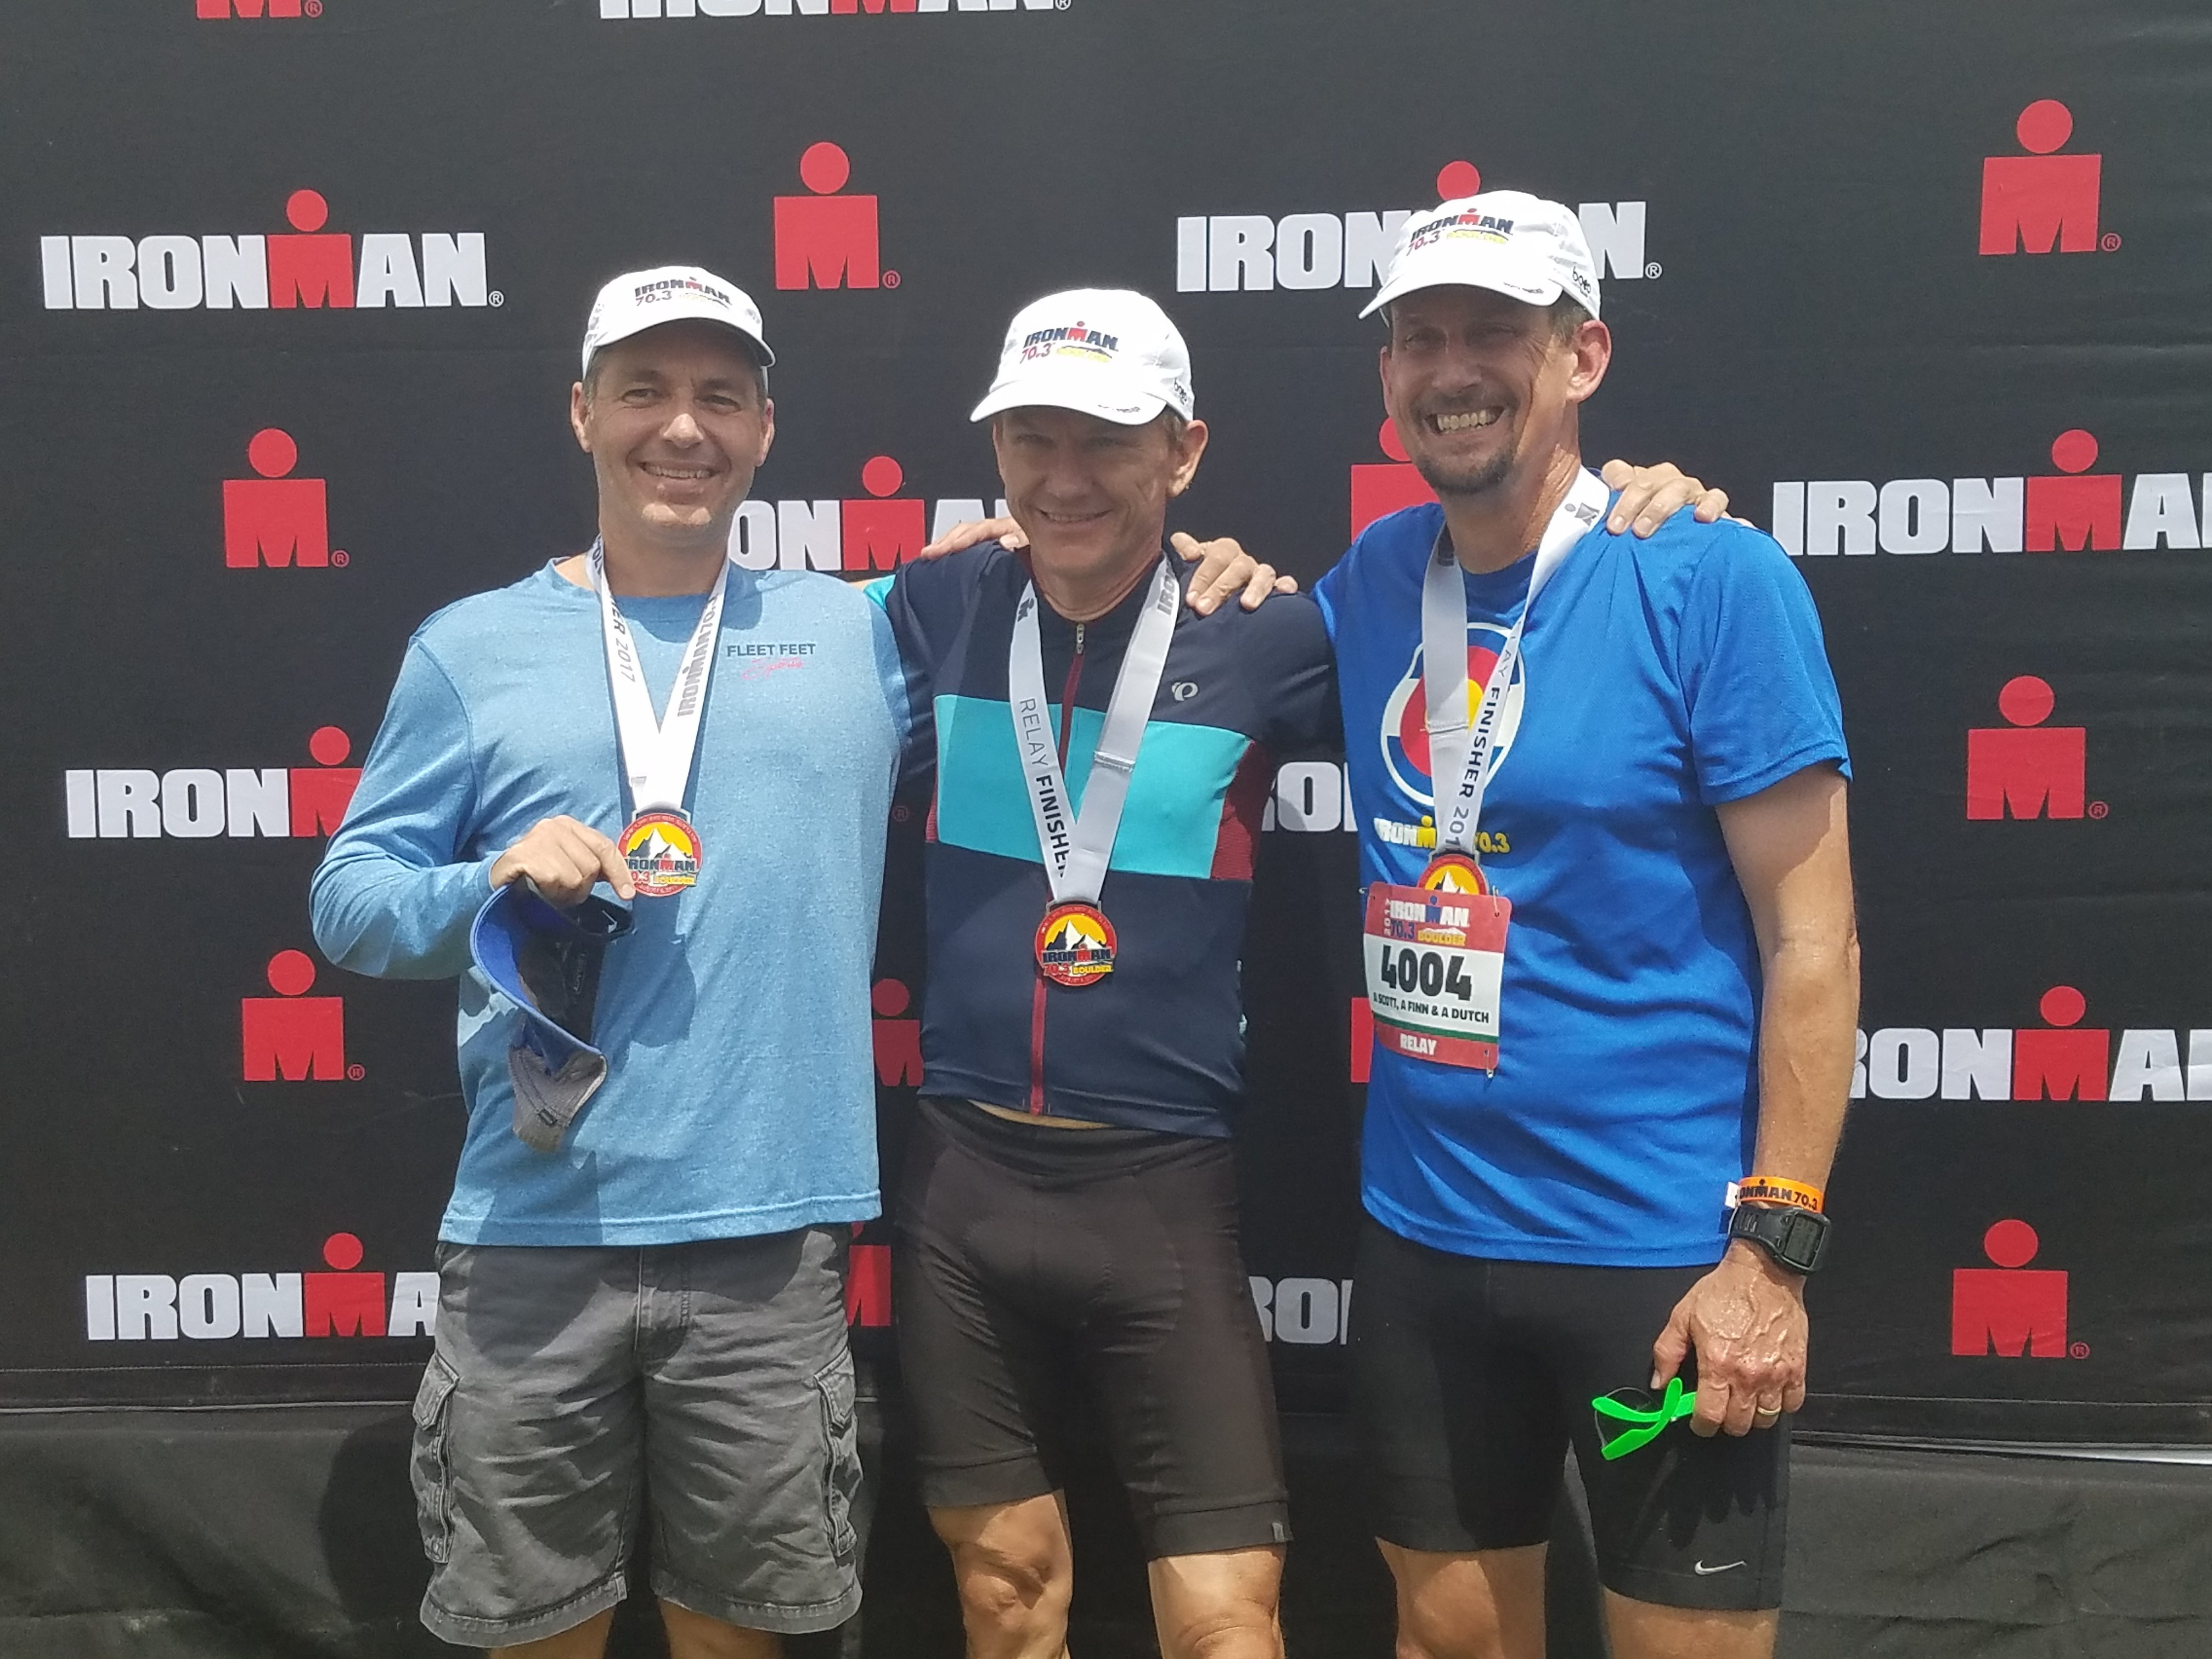 L to R: Gavin Maitland (swim), Harri Lintukorpi (bike), Greg Lems (run)